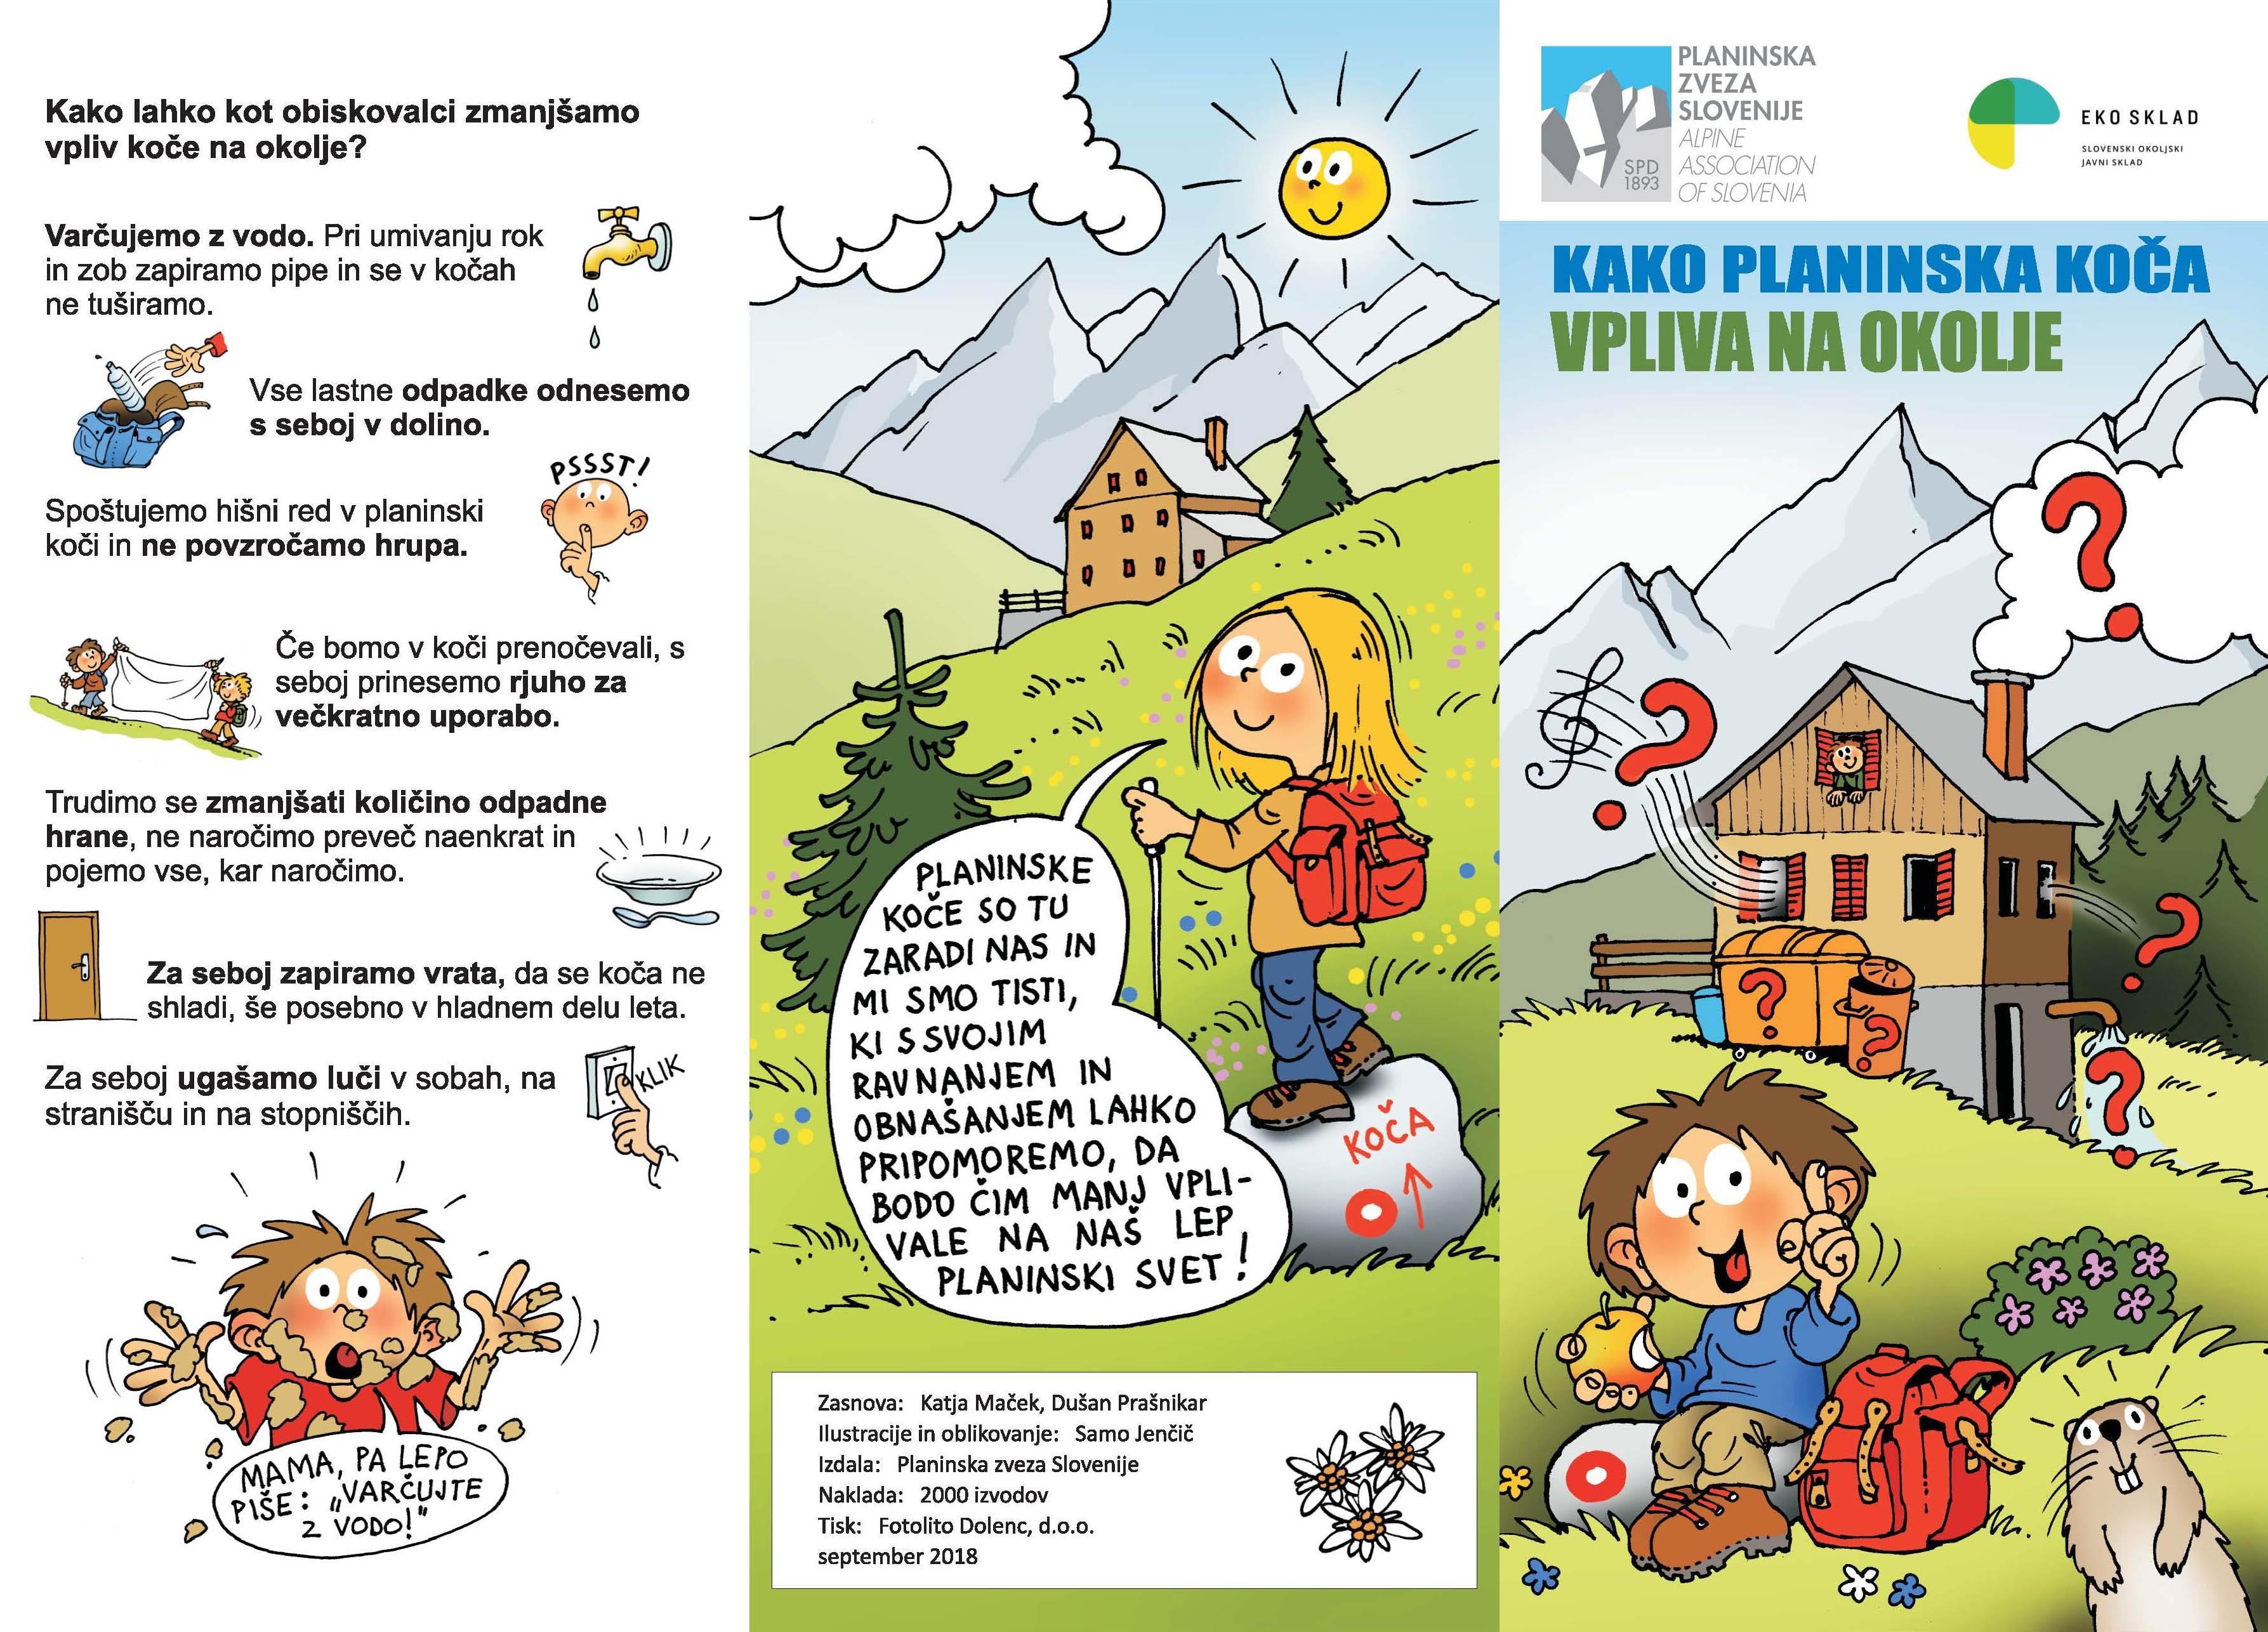 kako_planinska_koca_vpliva_na_okolje